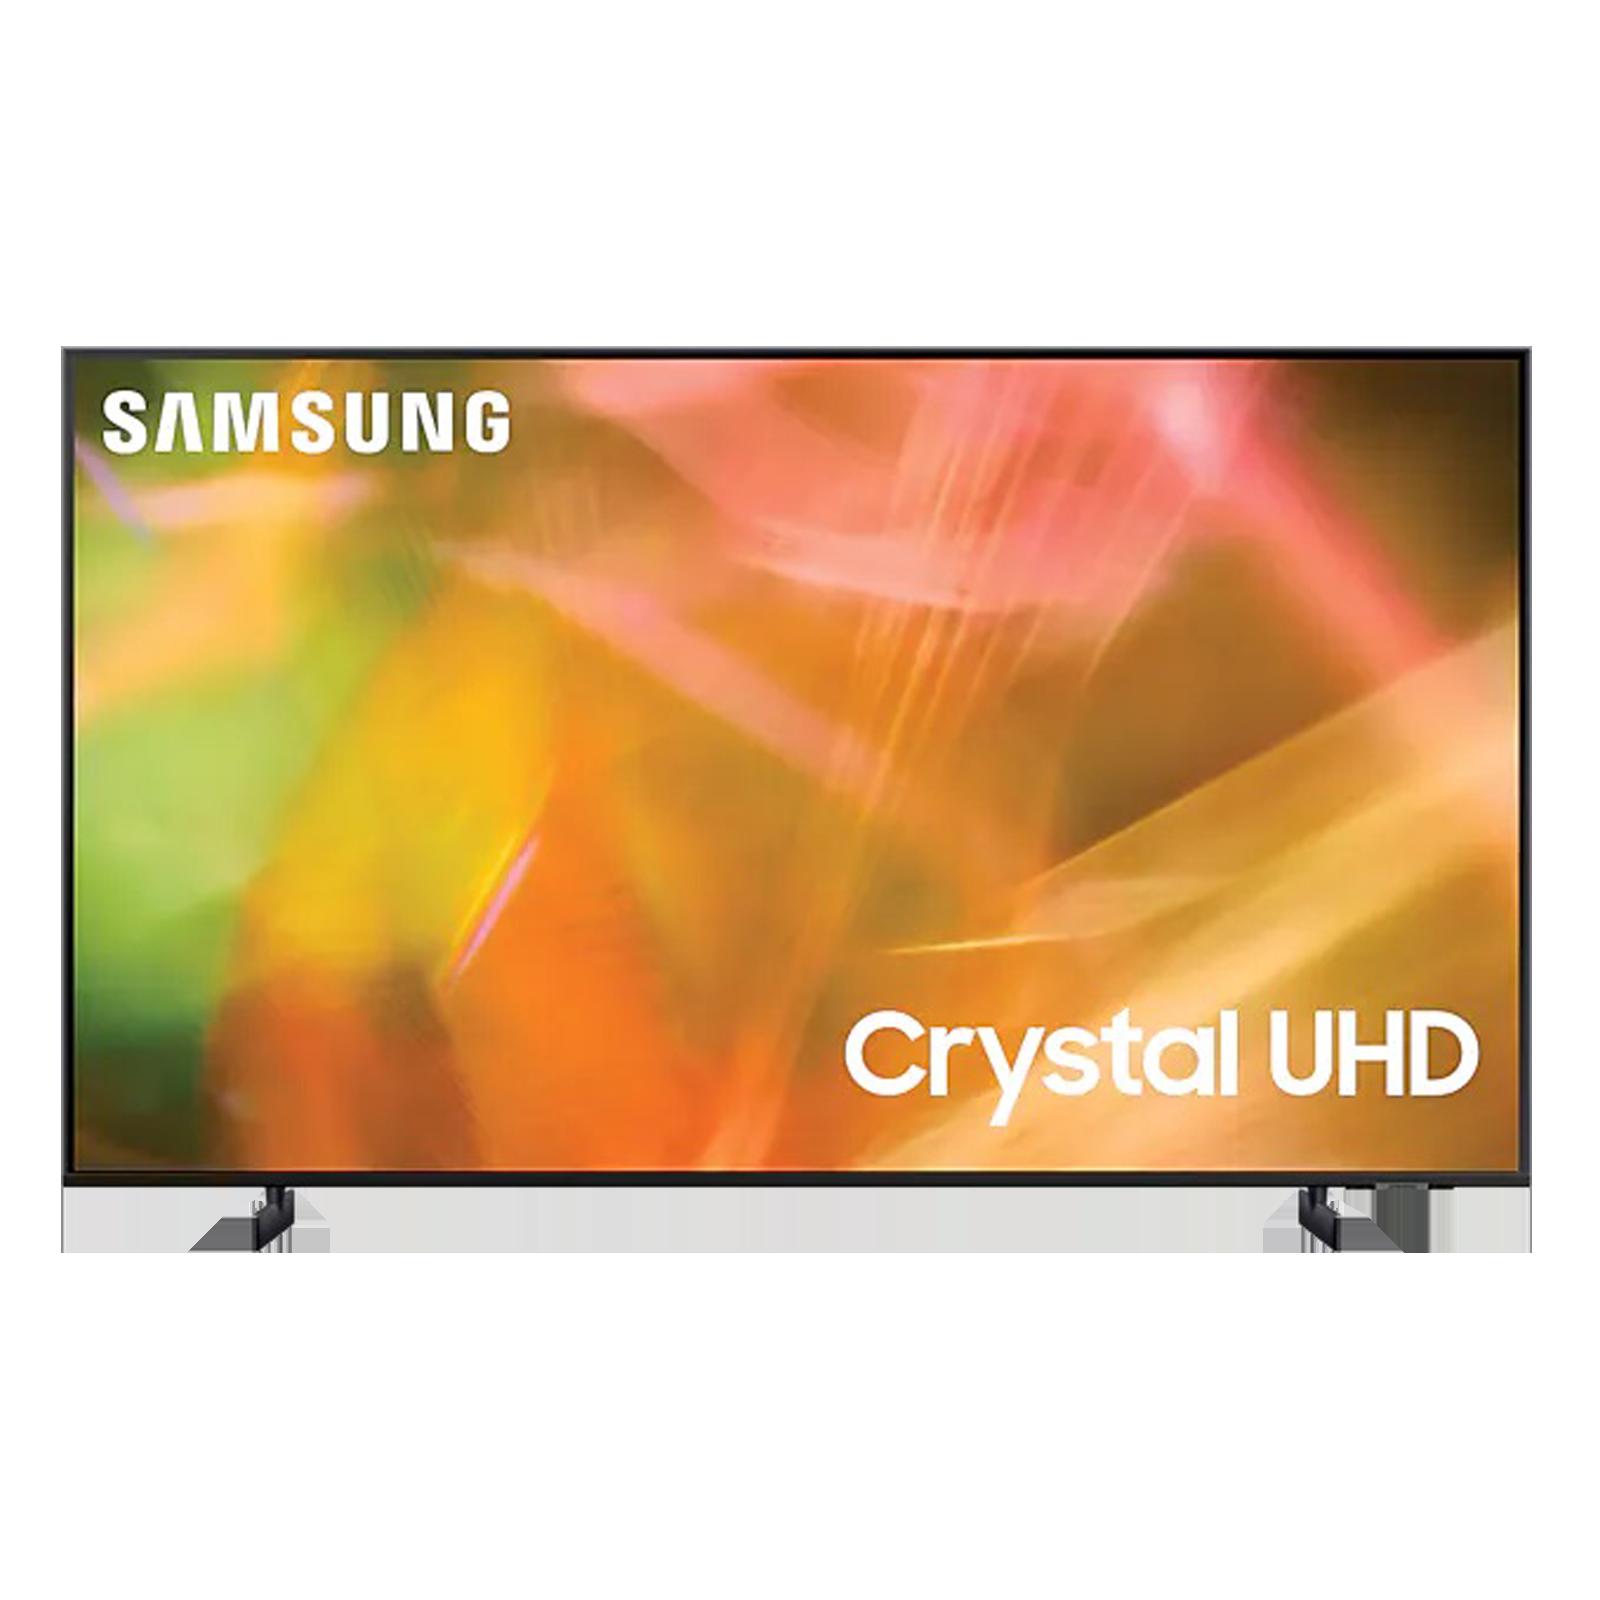 Samsung 8 Series 138cm (55 Inch) Ultra HD 4K LED Smart TV (Multi Voice Assistant Supported, UA55AU8200KLXL, Titan Grey)